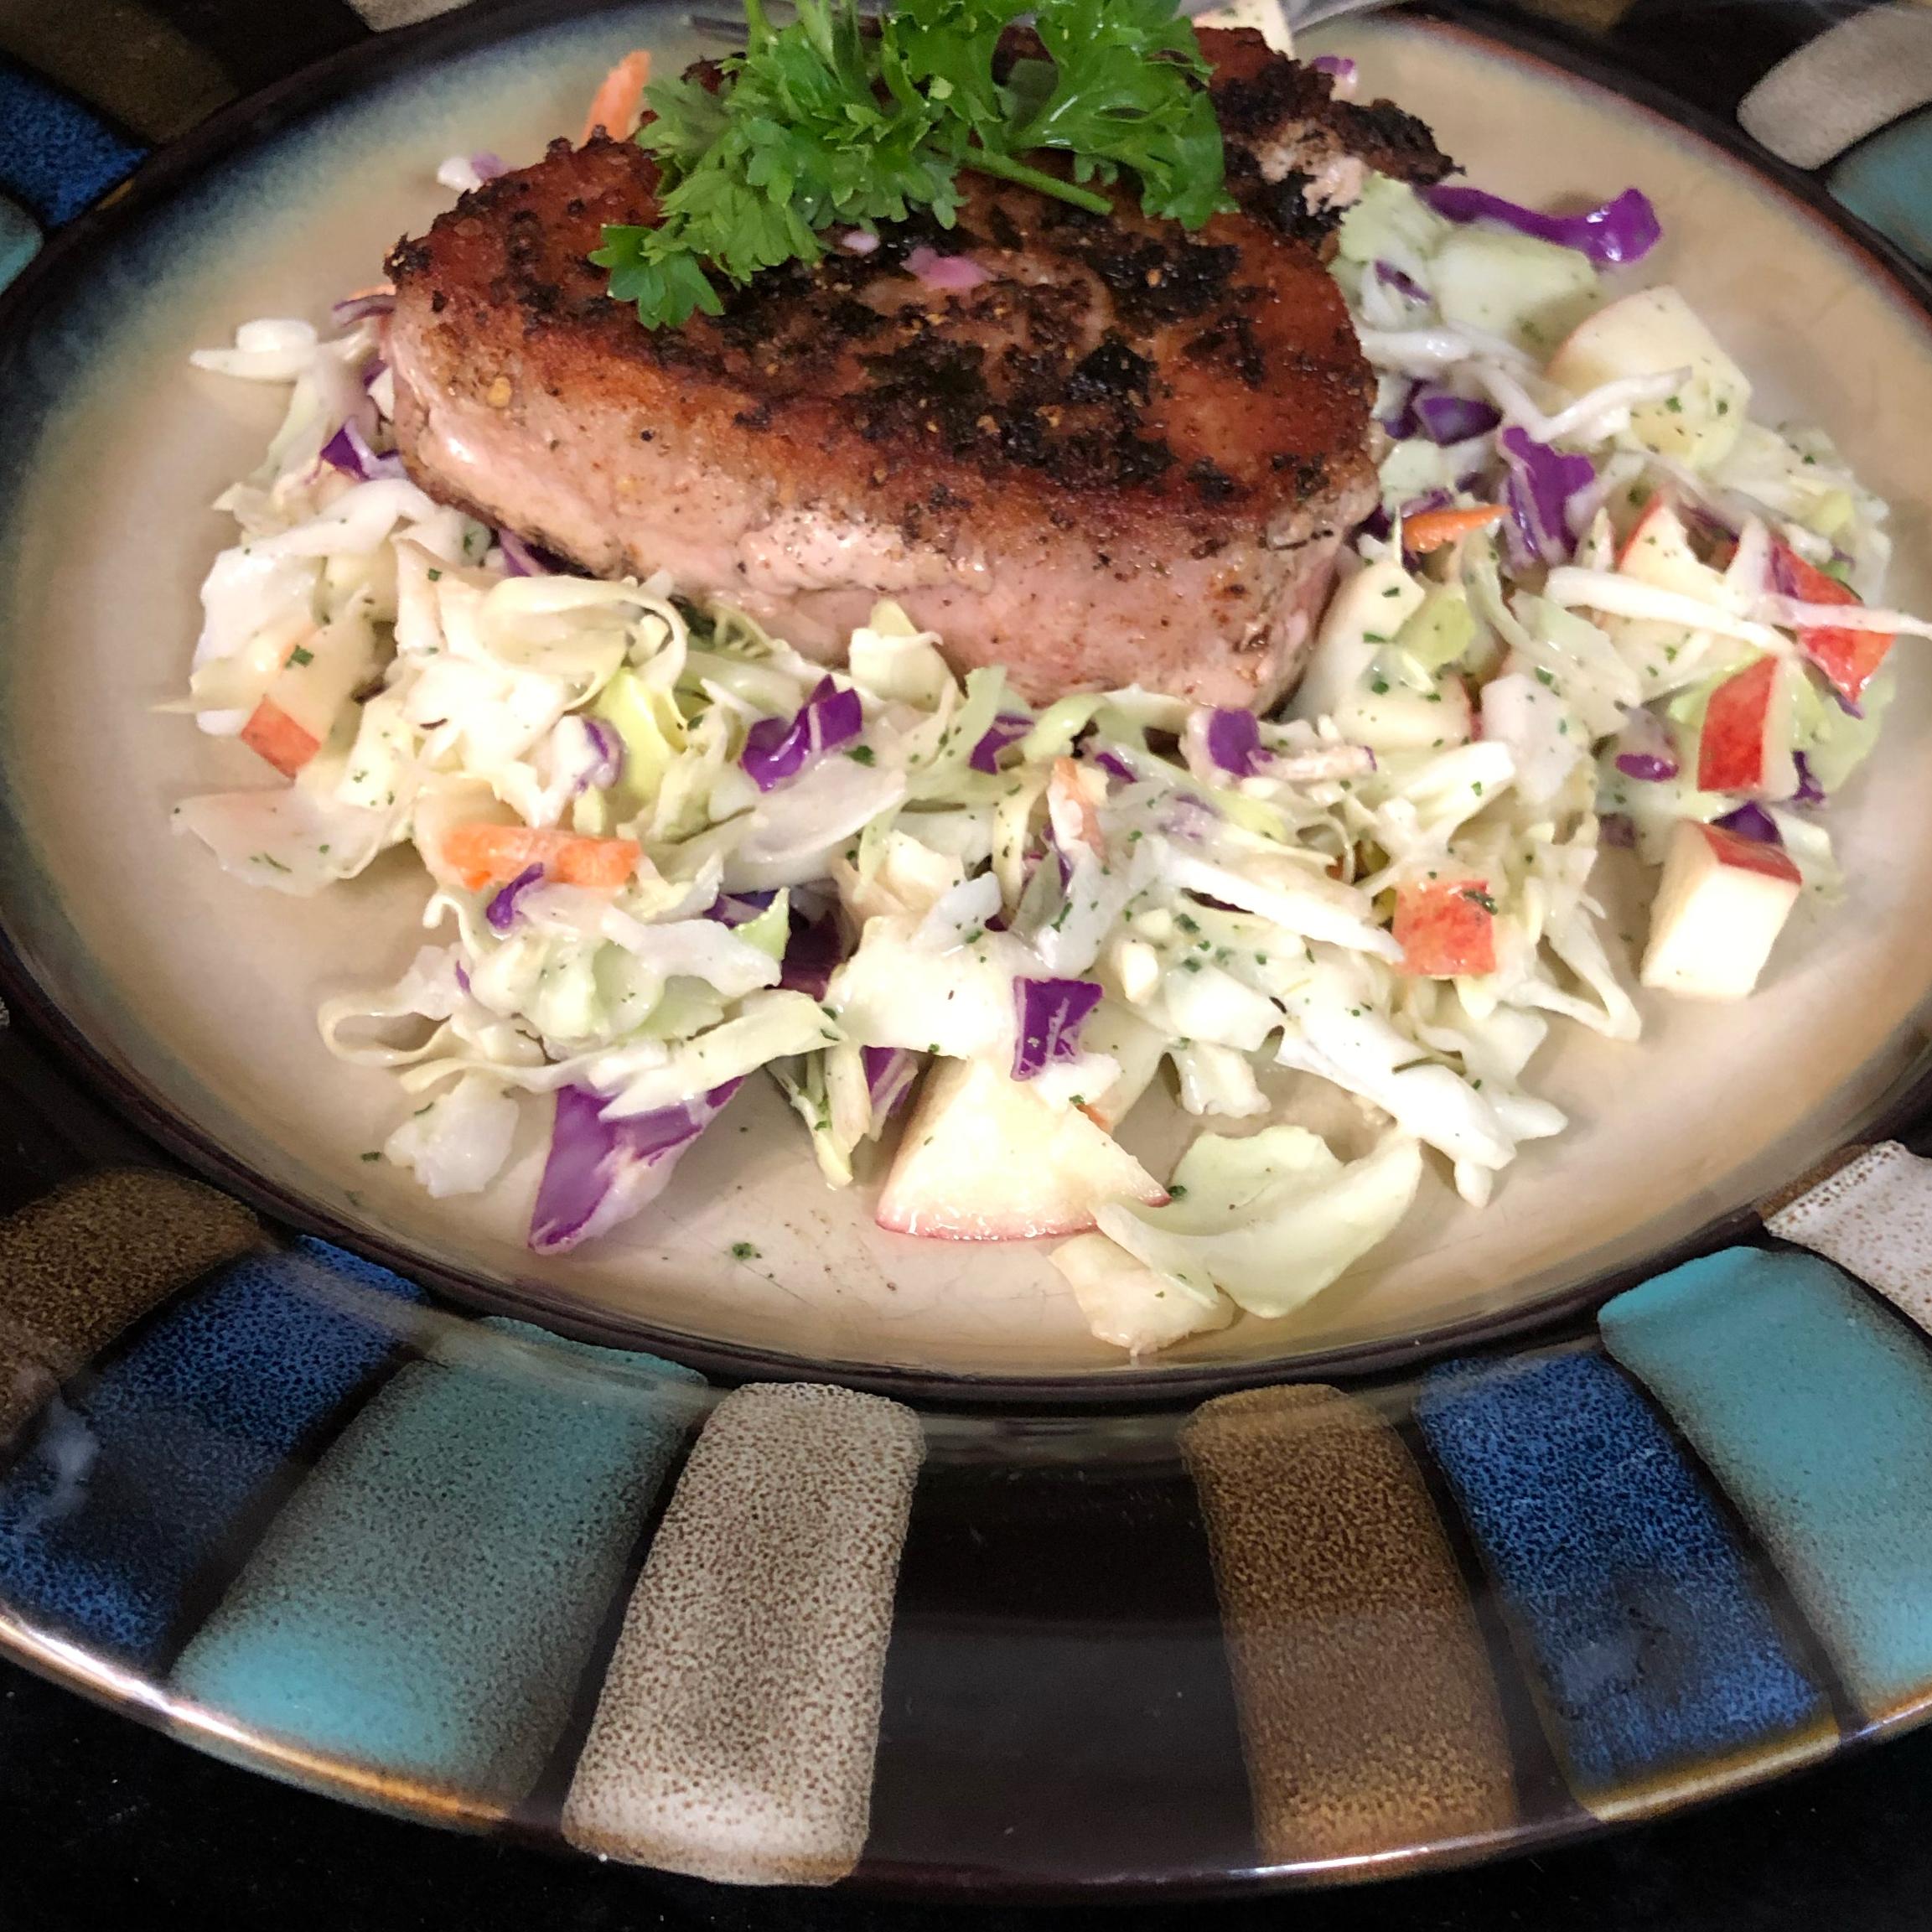 Spicy Rub for Seared Tuna Steaks